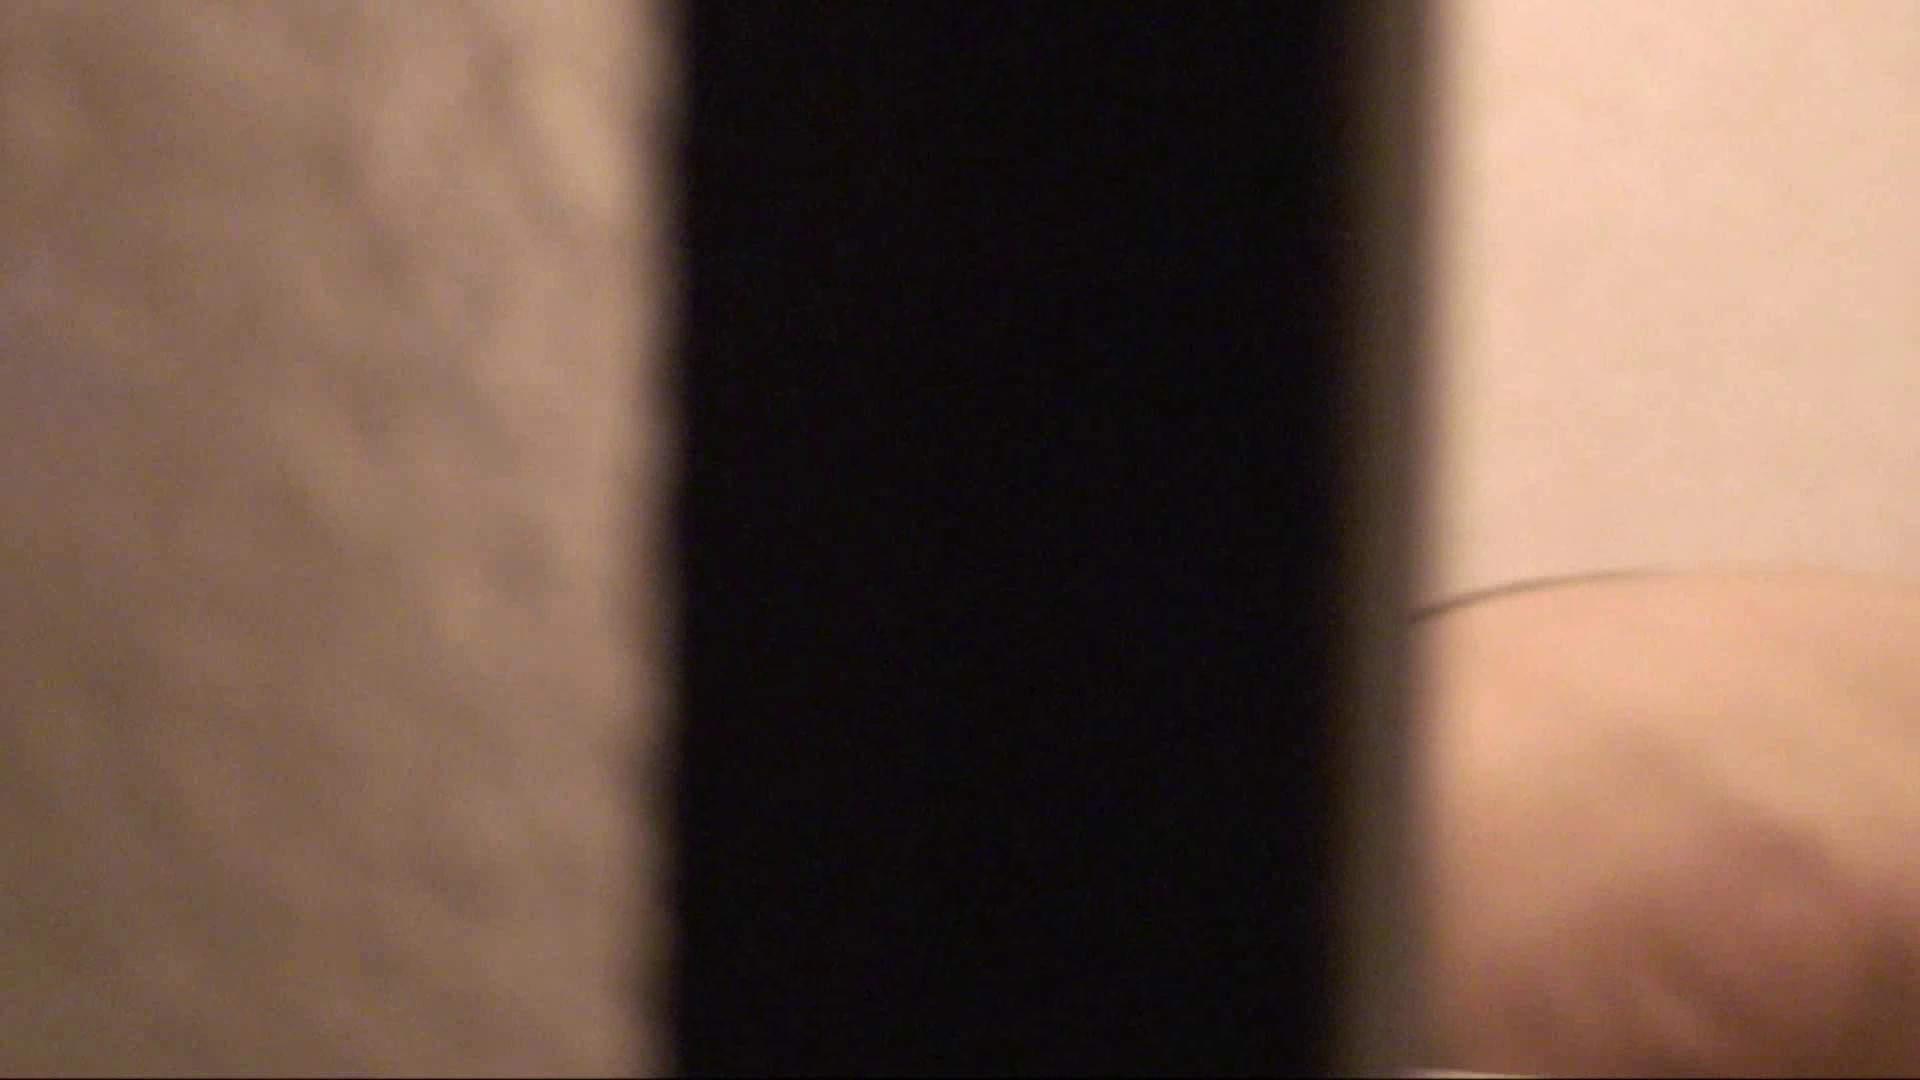 vol.01必見!白肌嬢の乳首が丸見え。極上美人のすっぴん顔をハイビジョンで! 美人 AV無料動画キャプチャ 21pic 18